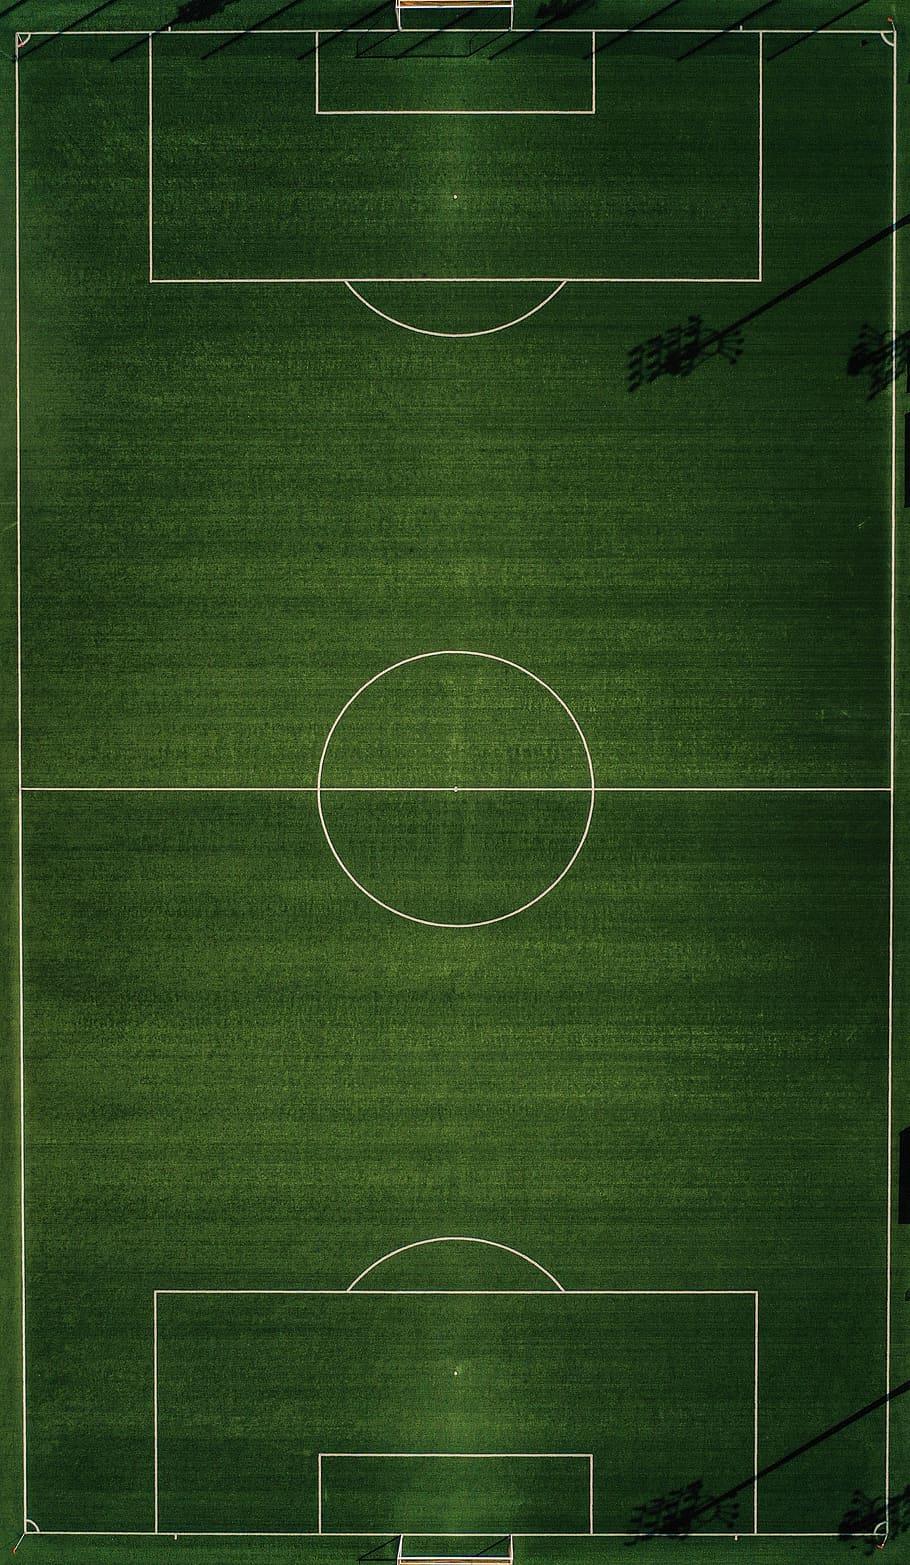 Wallpaper Lapangan Bola : wallpaper, lapangan, Sports, Background, 1080P,, Wallpapers, Download, Wallpaper, Flare